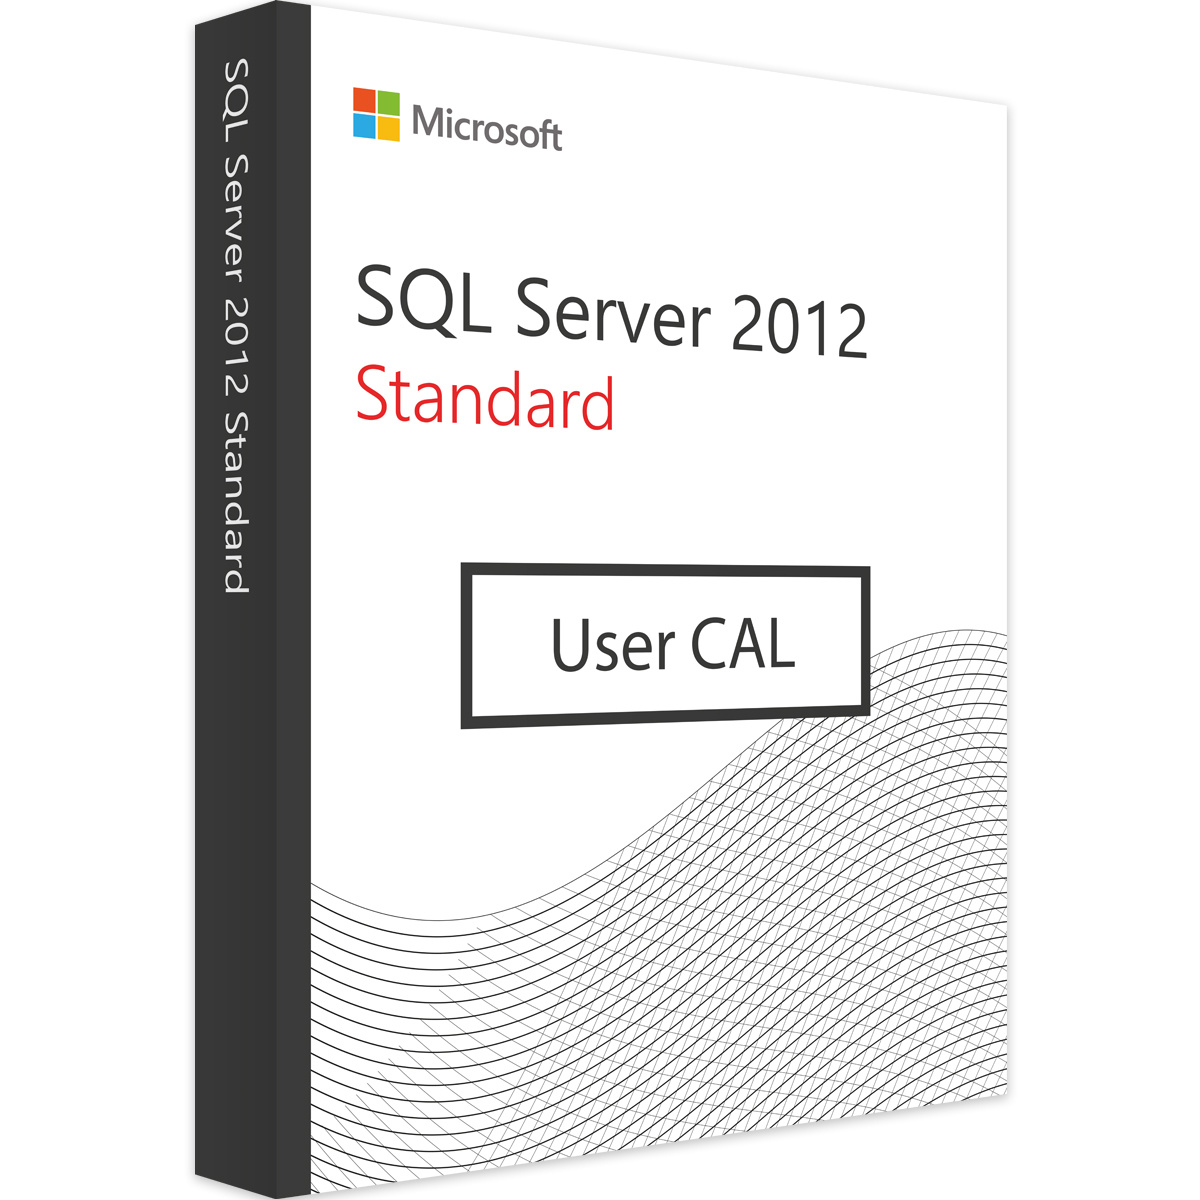 Microsoft SQL Server 2012 User CAL - Microsoft Open License